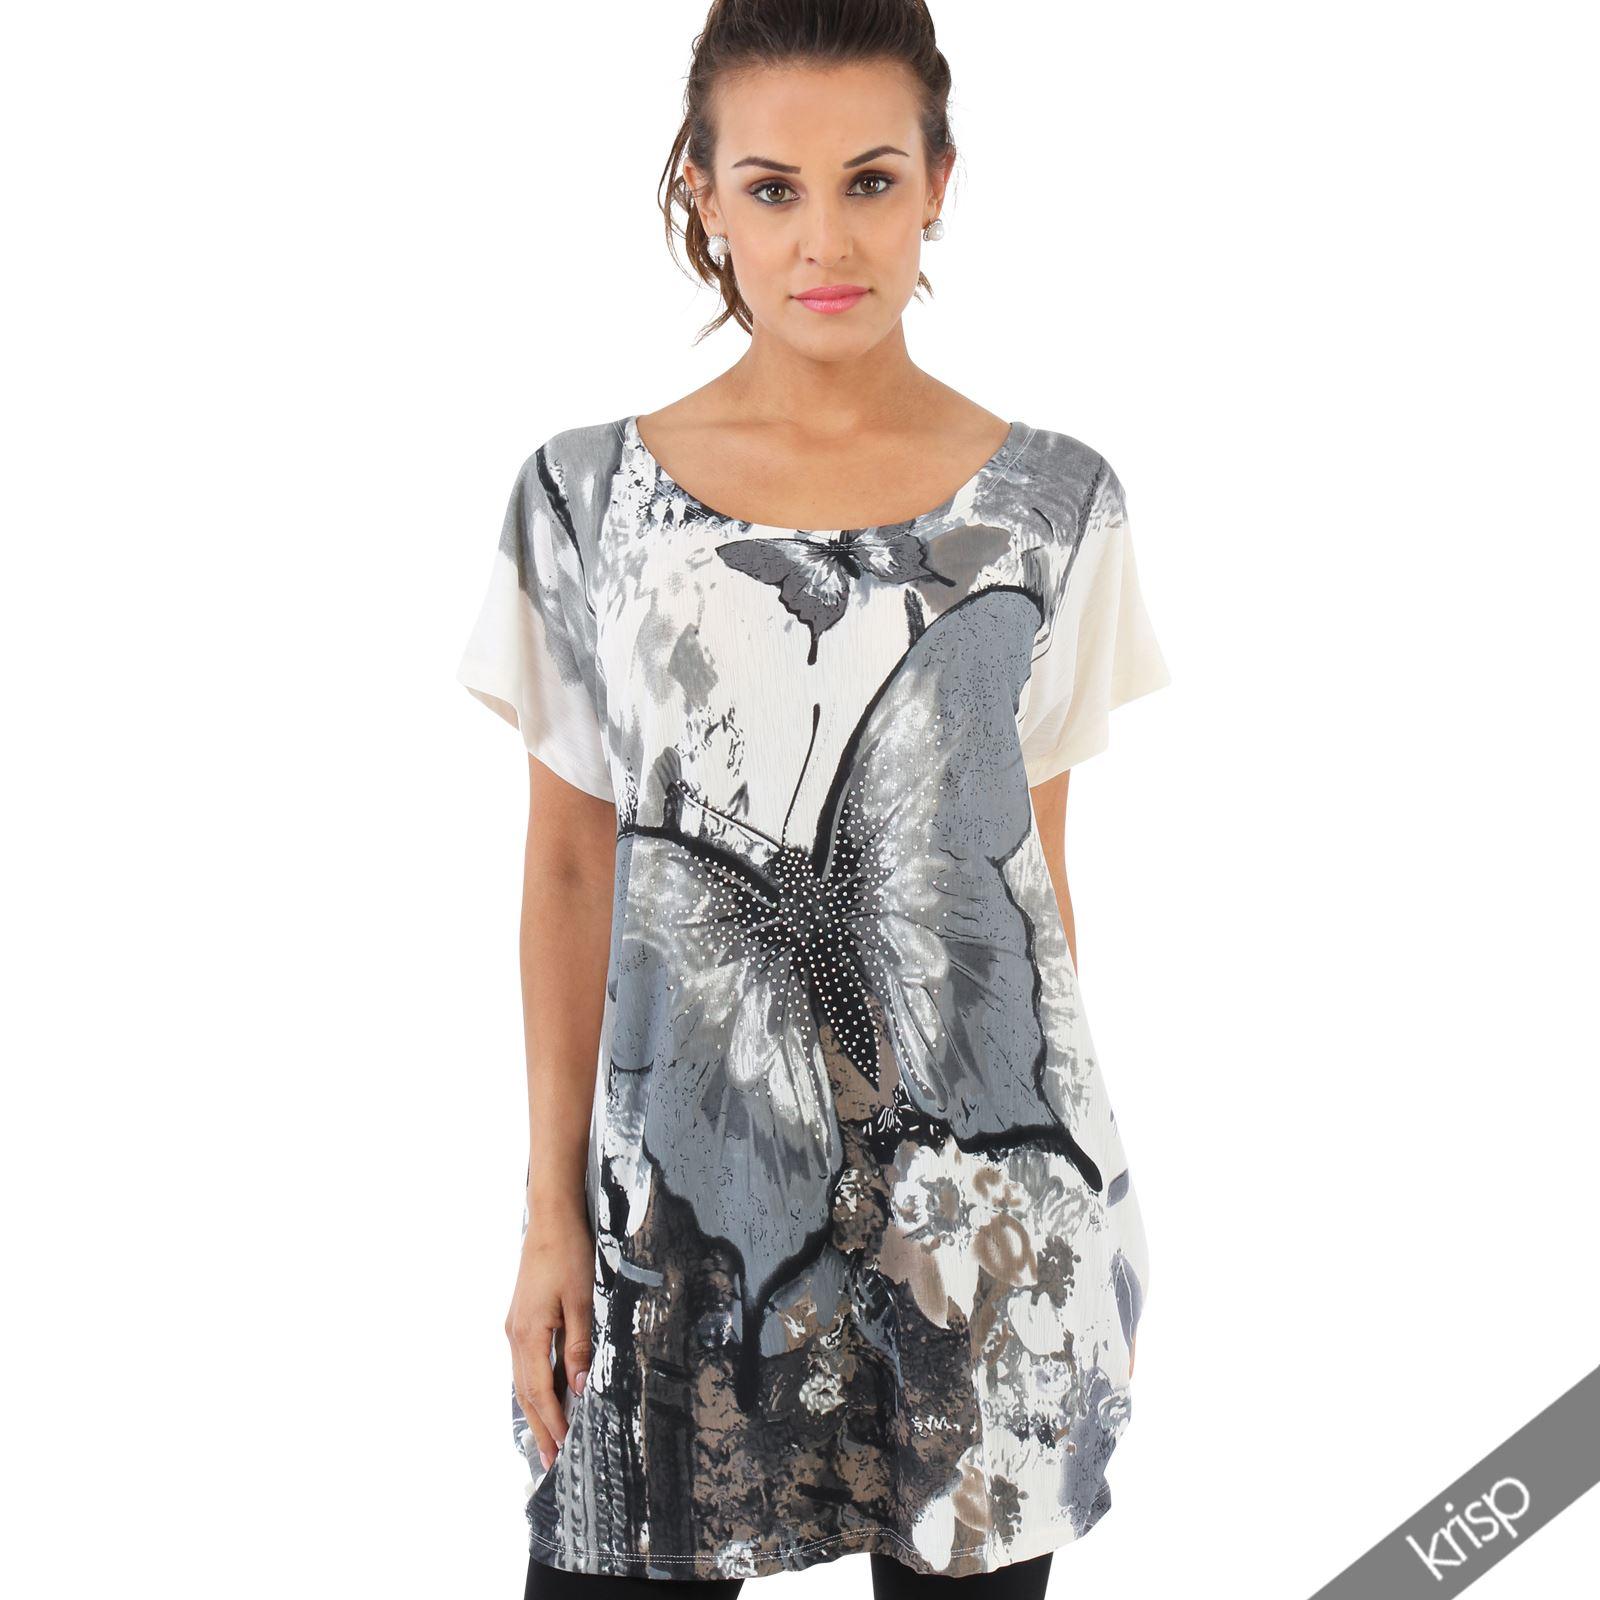 damen oversize t shirt mit strass schmetterlingsmotiv bluse tunika longtop ebay. Black Bedroom Furniture Sets. Home Design Ideas